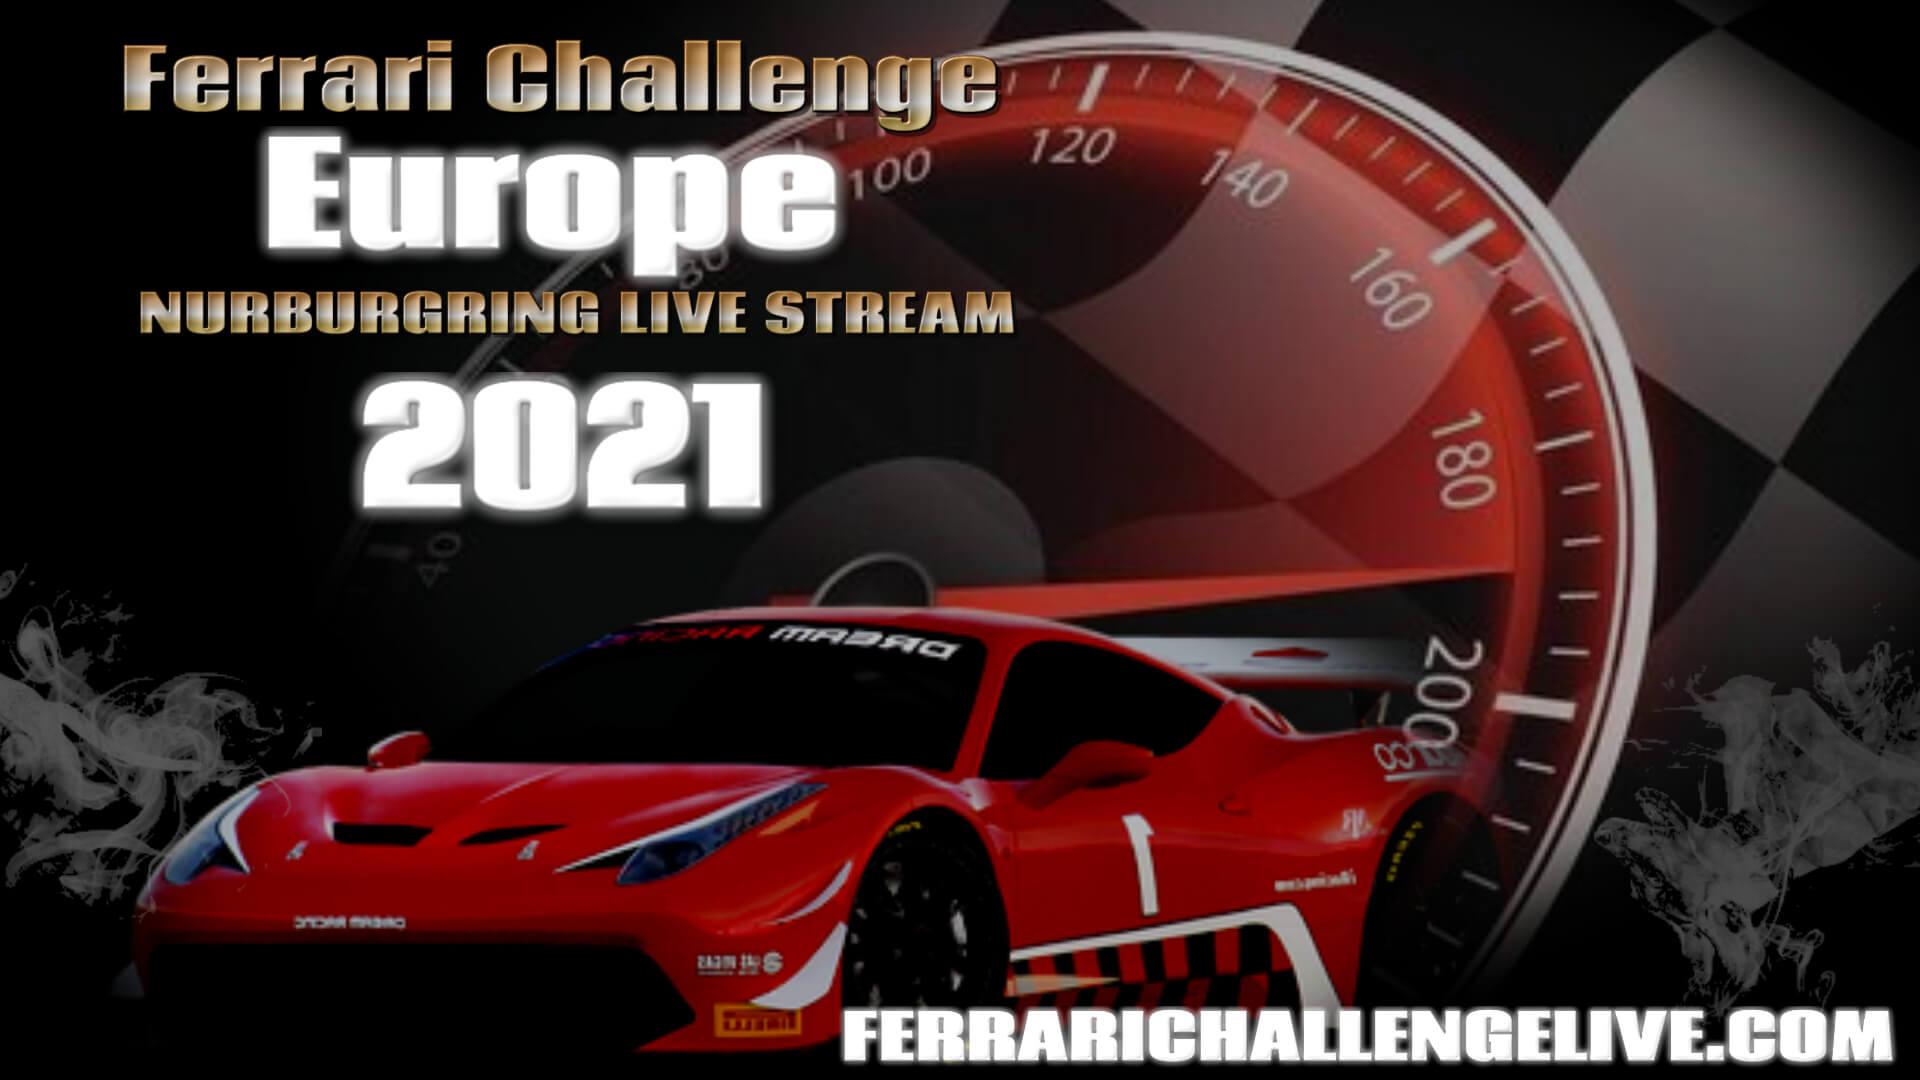 Nurburgring Live Stream 2021 | Ferrari Challenge